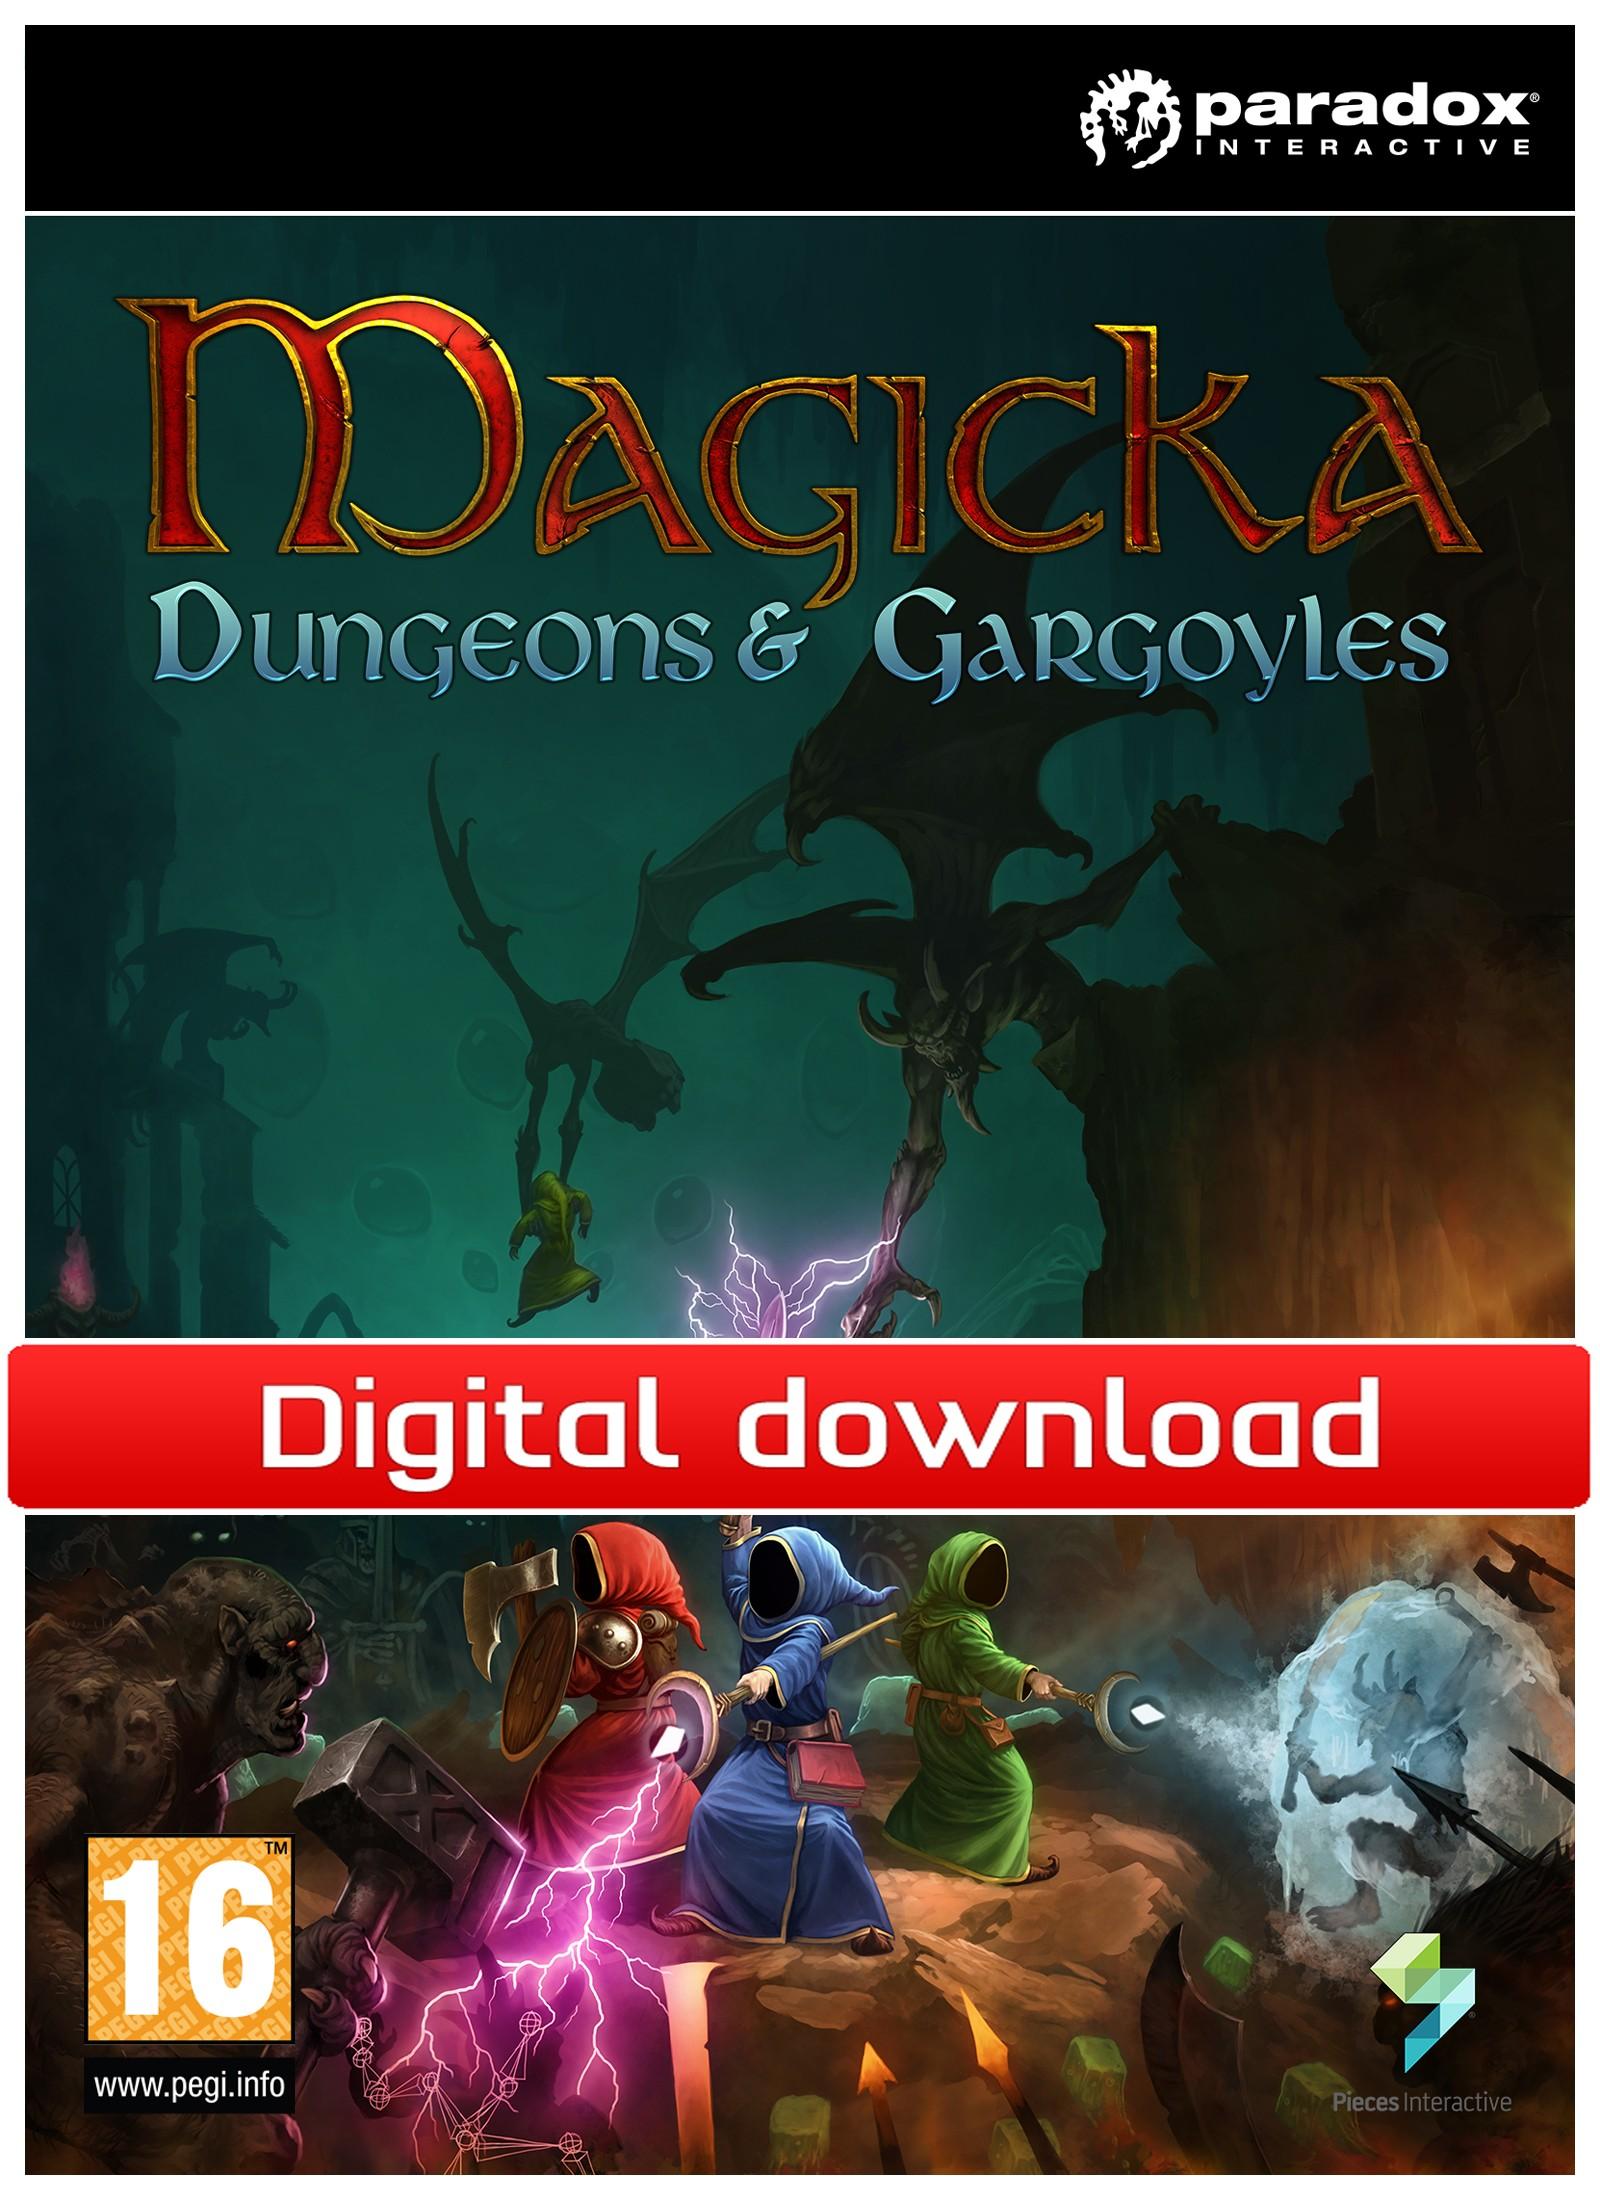 34077 : Magicka DLC: Dungeons & Gargoyles (PC nedlastning)